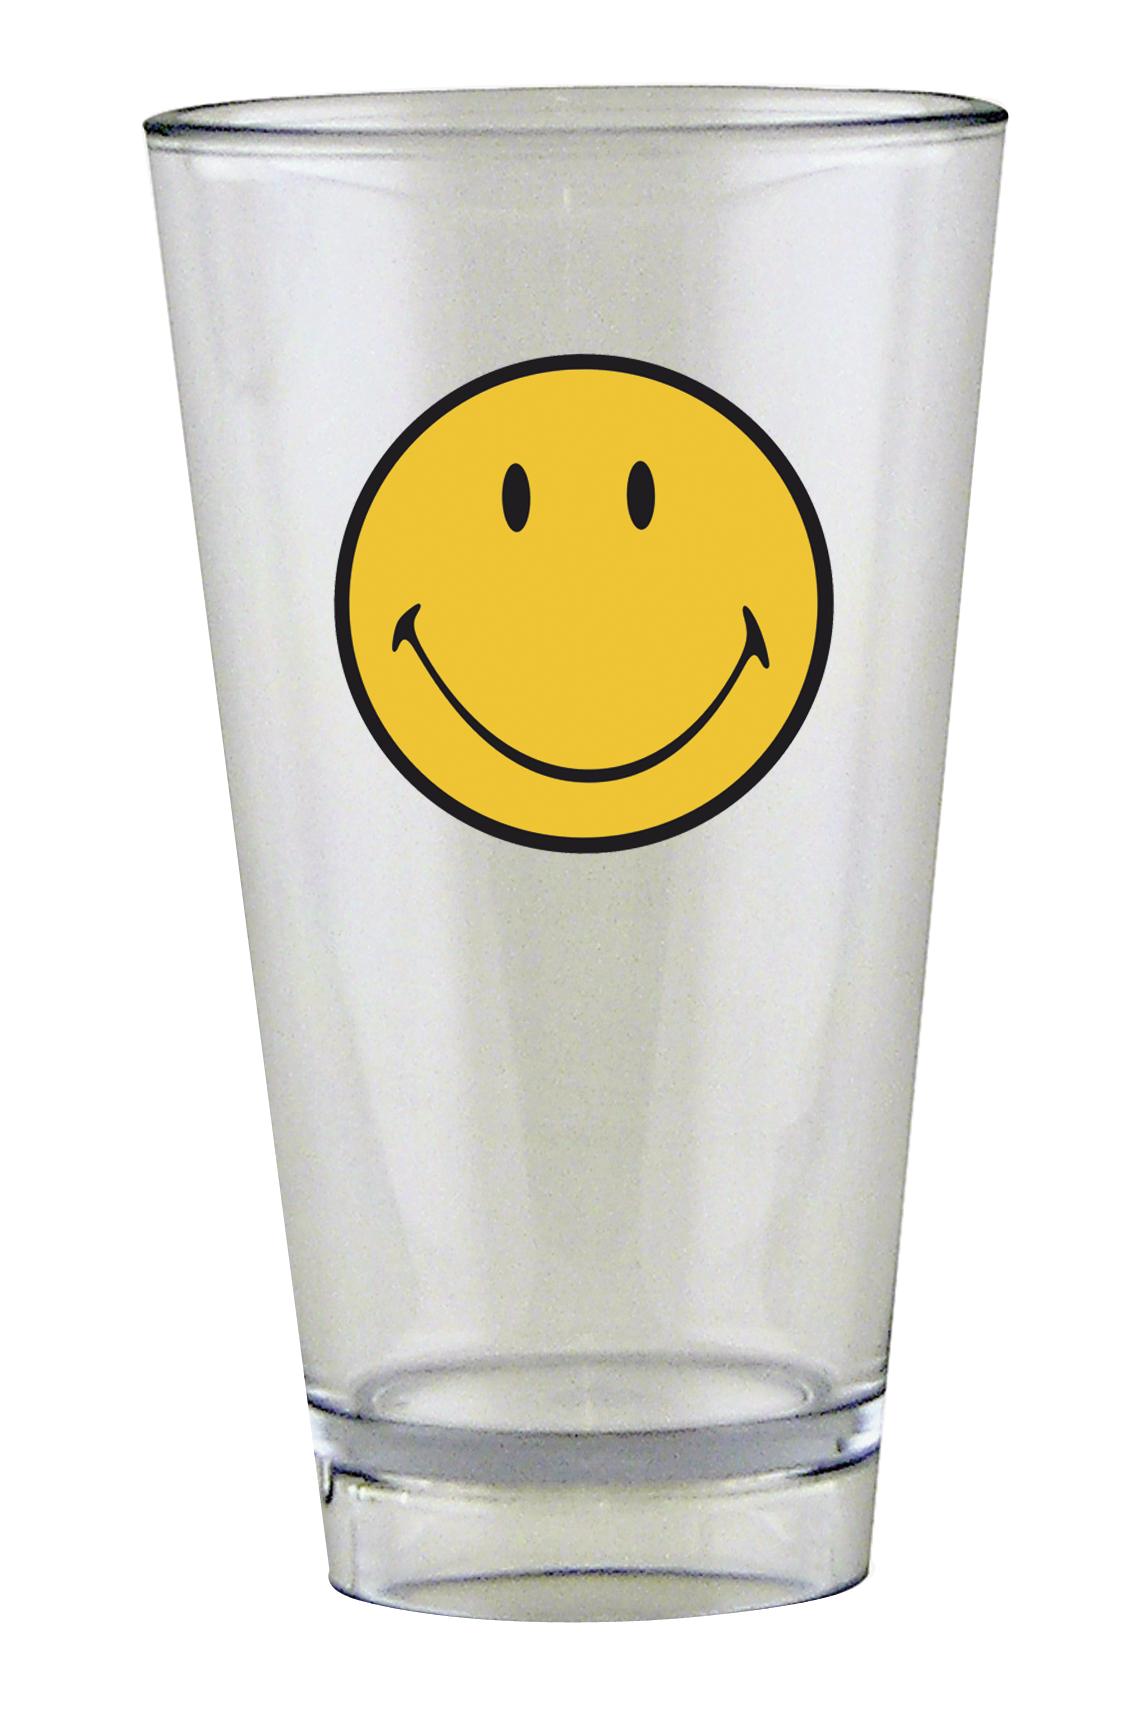 Pahar pentru party Smiley Tumbler Galben/Transparent 330 ml